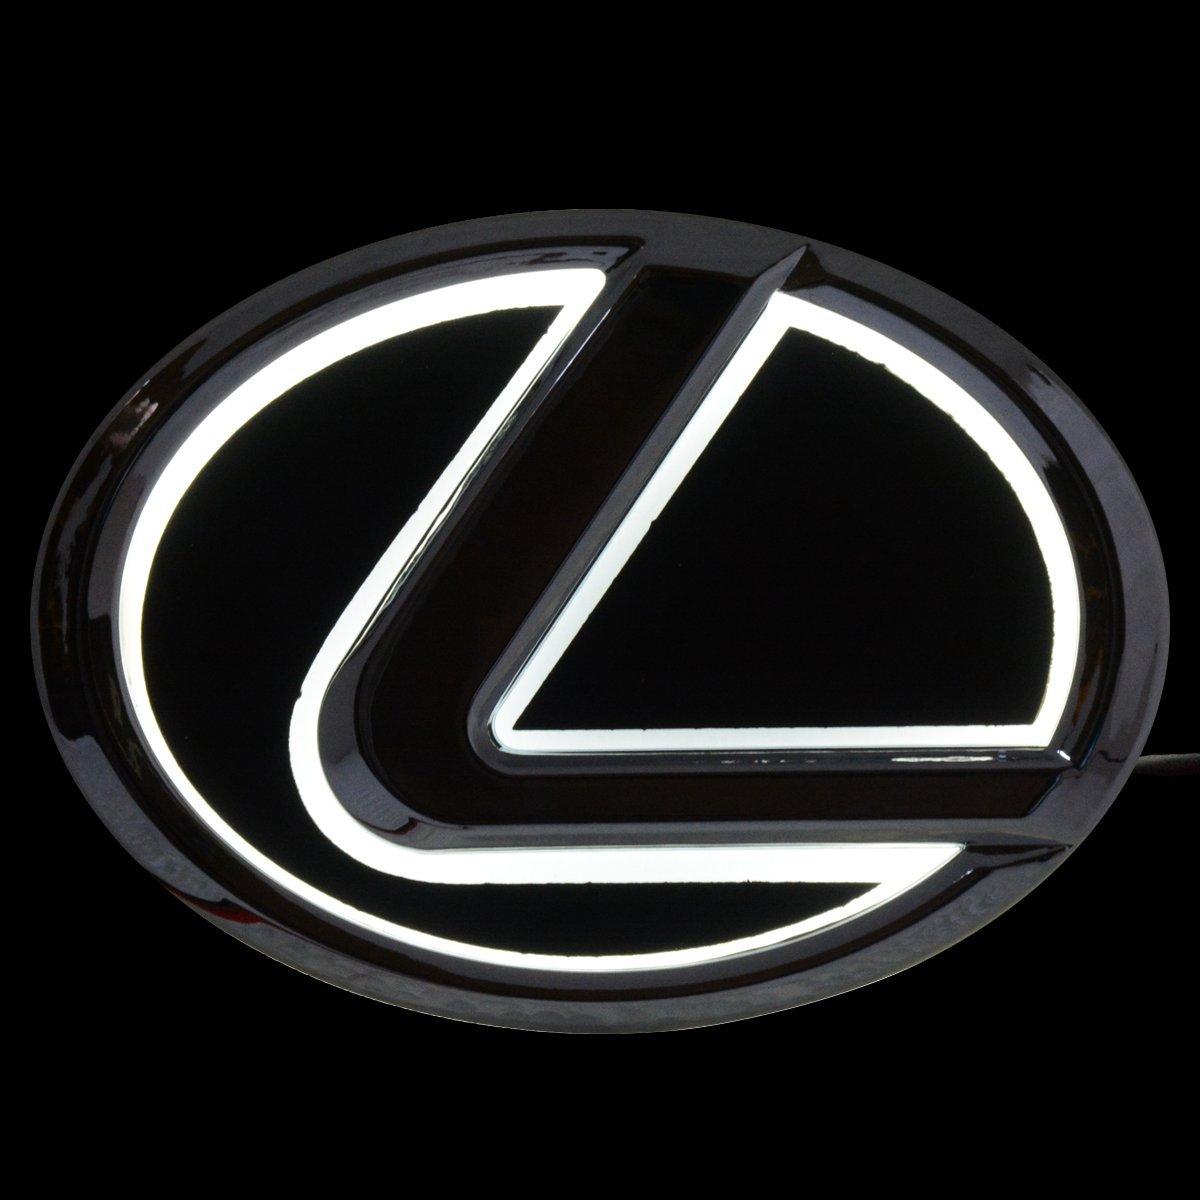 картинки логотип лексус телеведущей